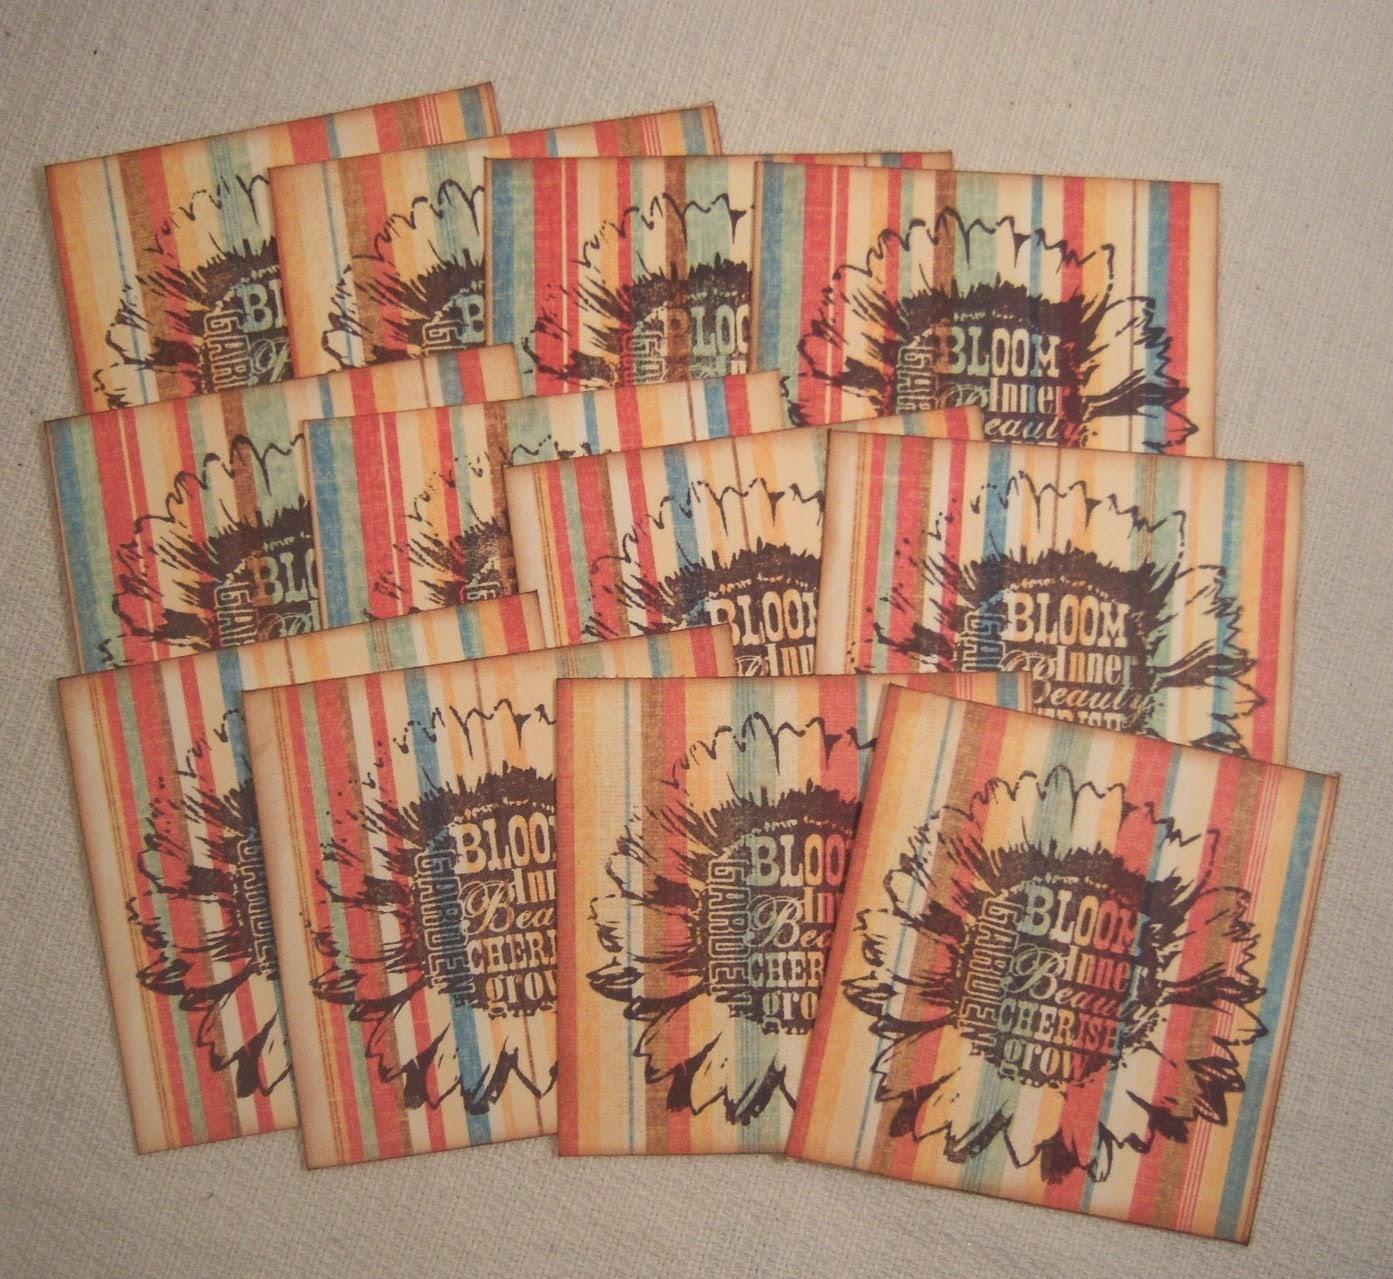 Bloom Flower Cherish Grow Garden Daisy Striped Hang Tags - Vintage Retro Inspired